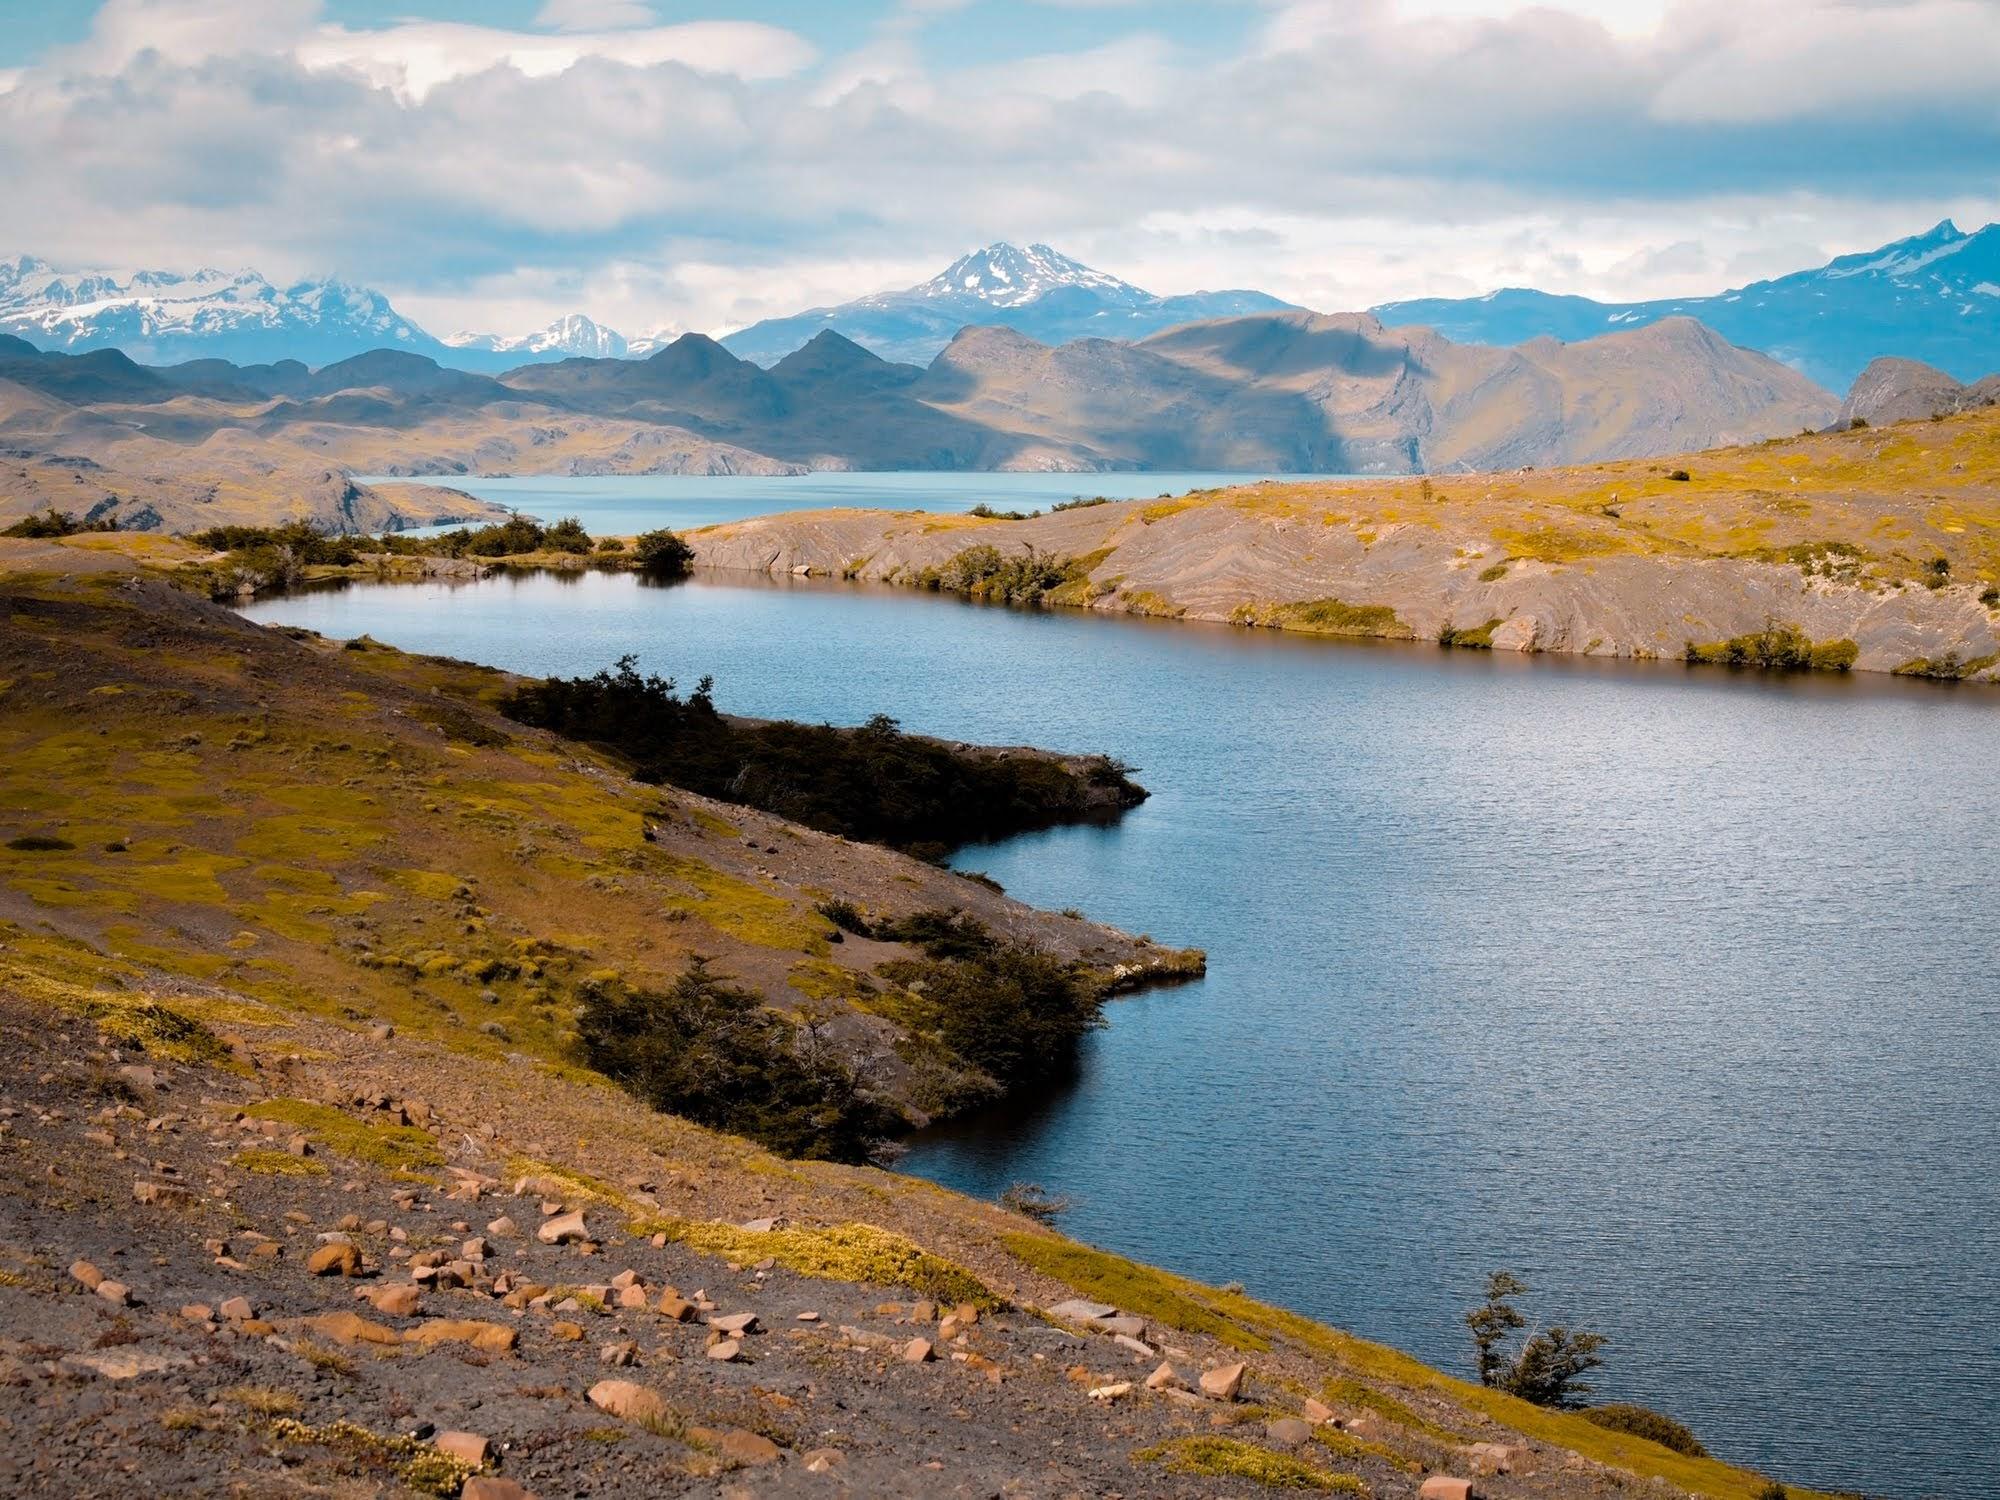 Approaching Lago Nordernskjold